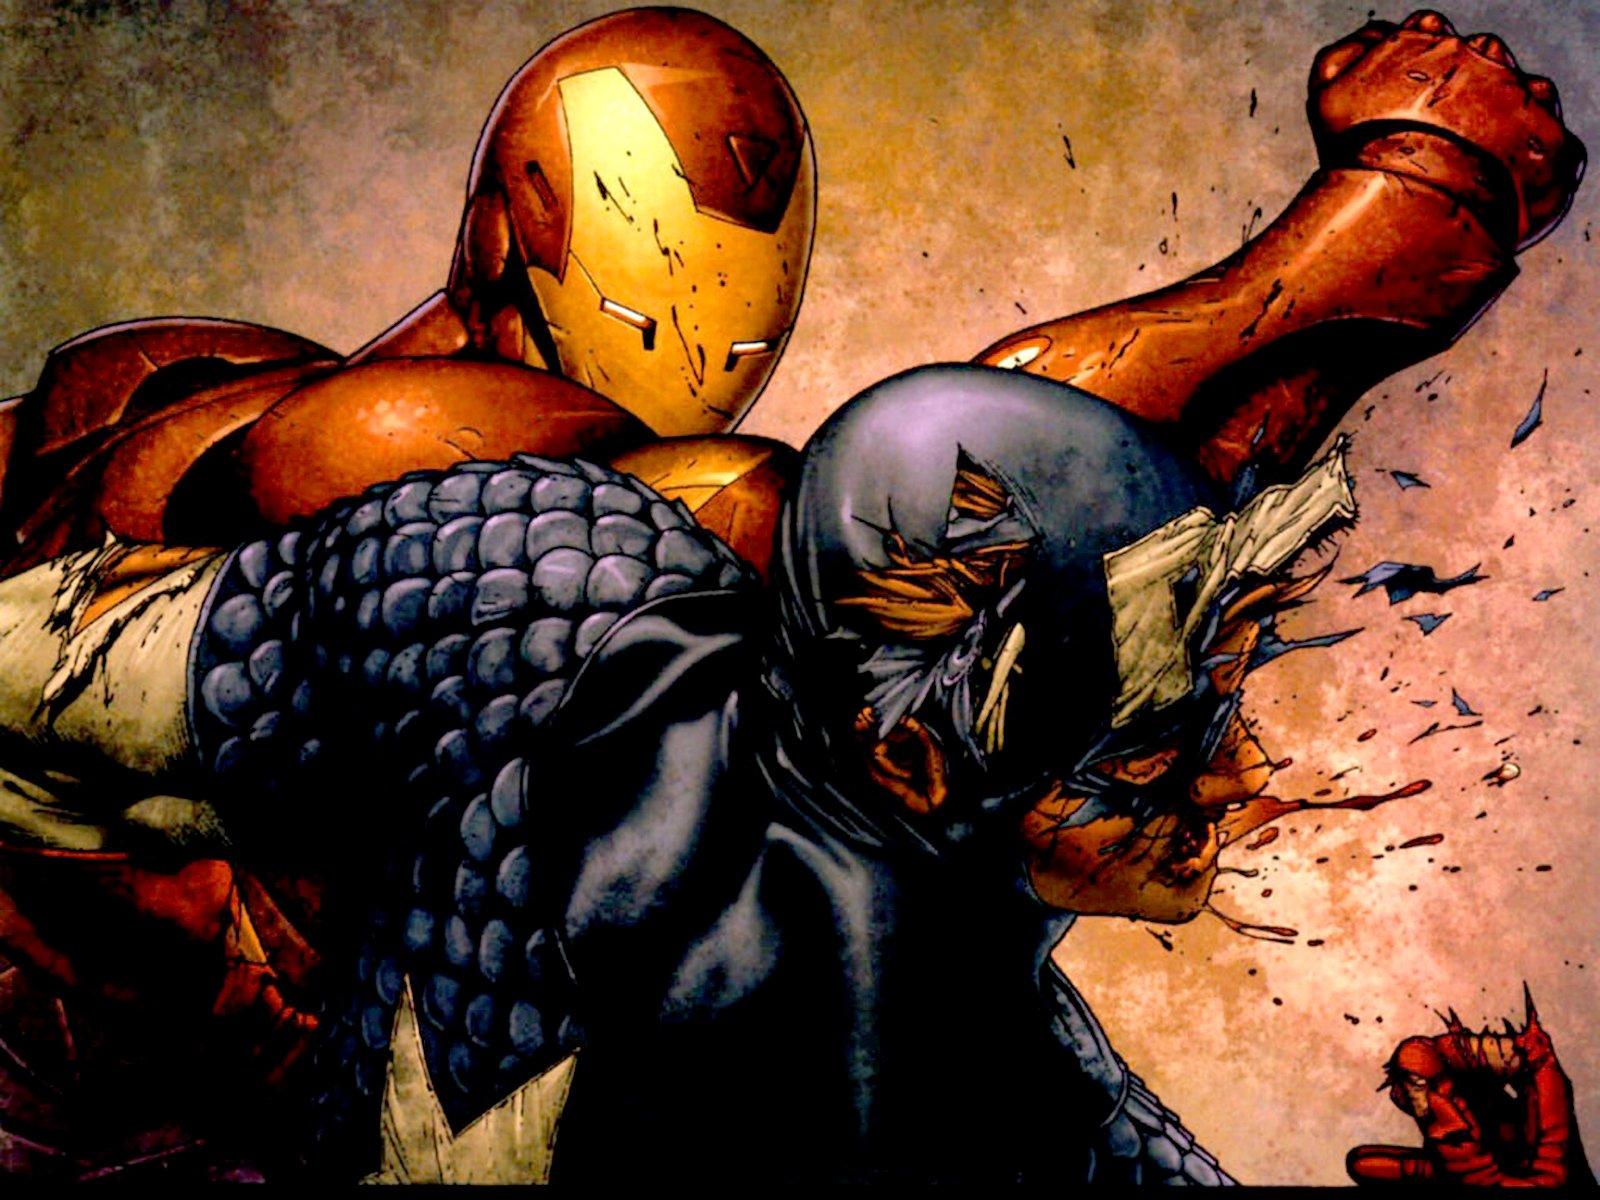 Will Iron Man Be A Jerk In Captain America: Civil War? 1